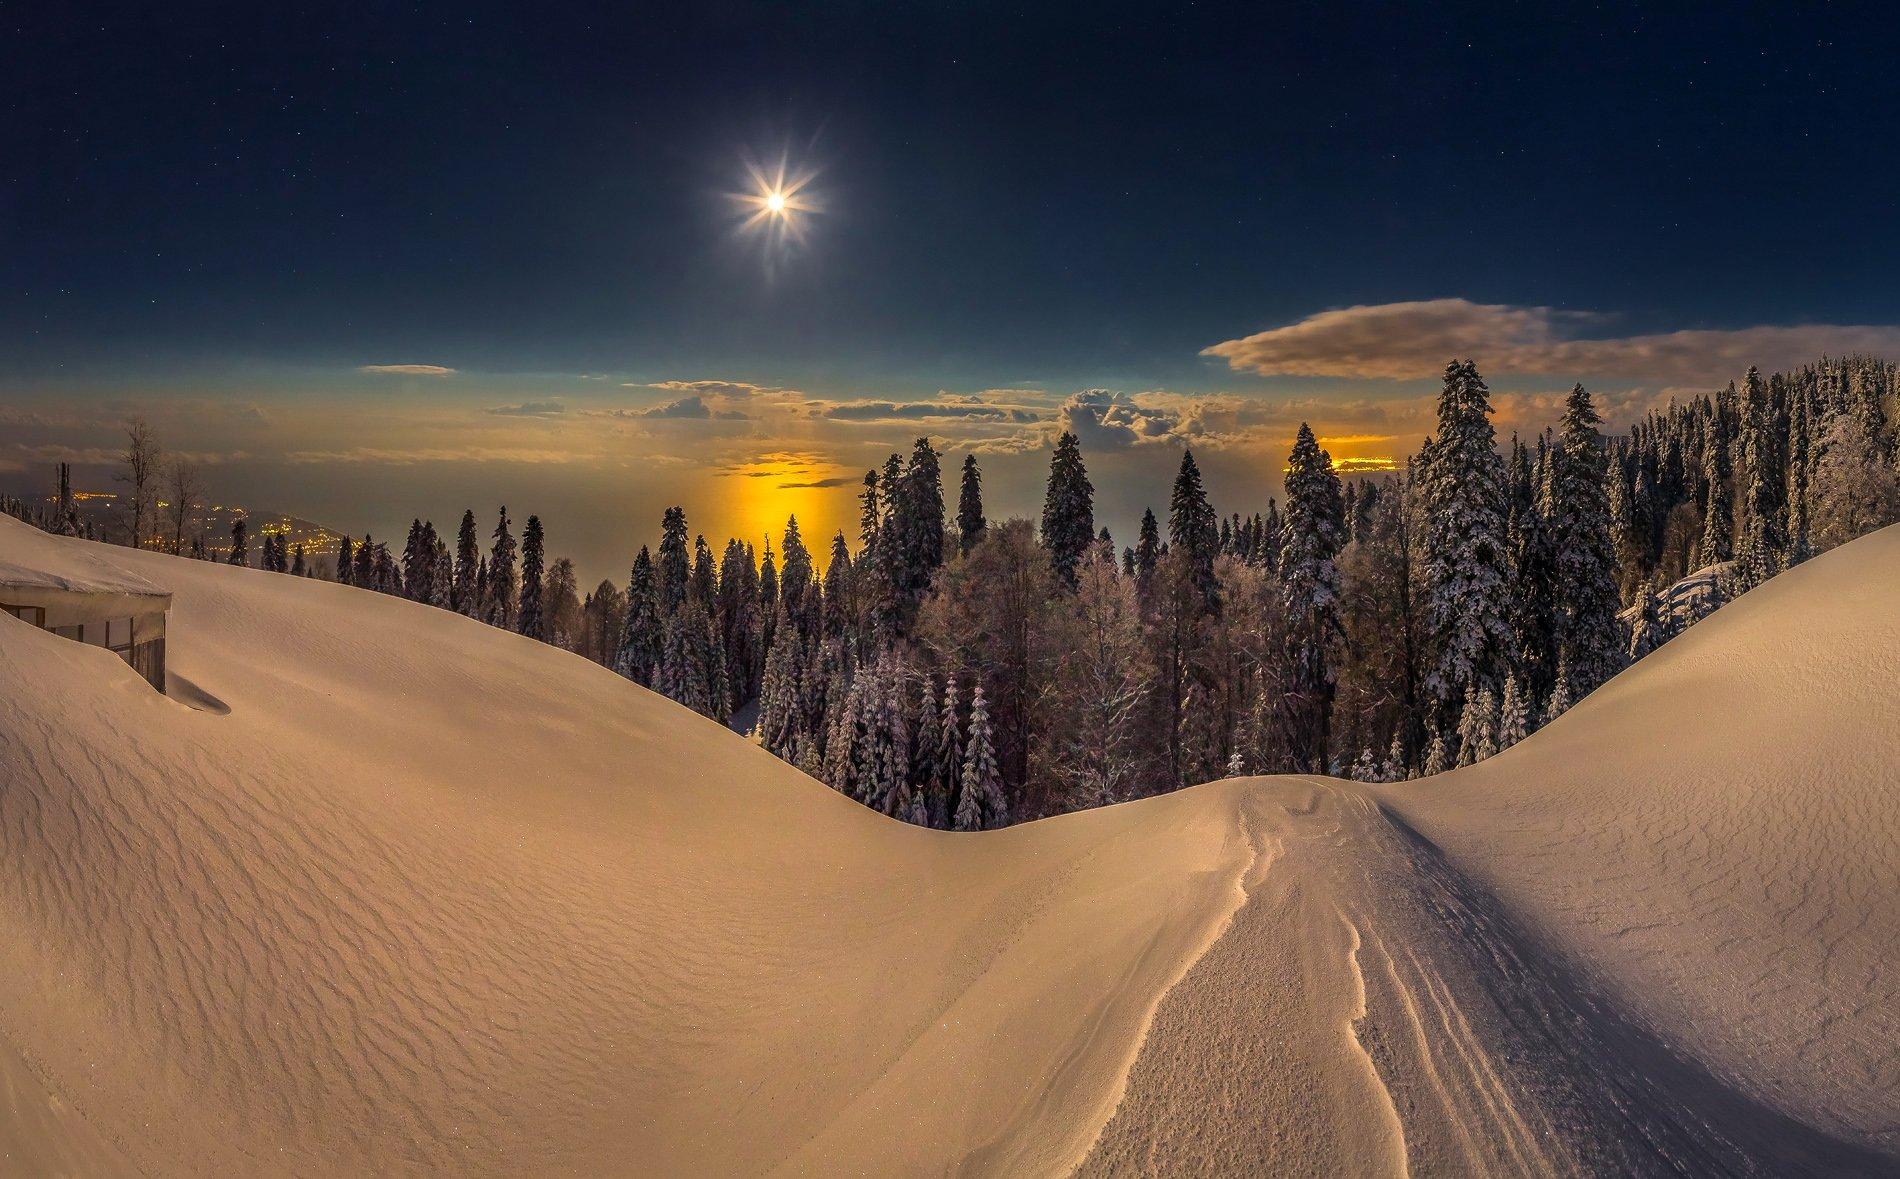 абхазия, горы, ночь, зима, полнолунье, луна, чёрное море, снег, лес, пихты, фактура., Лашков Фёдор